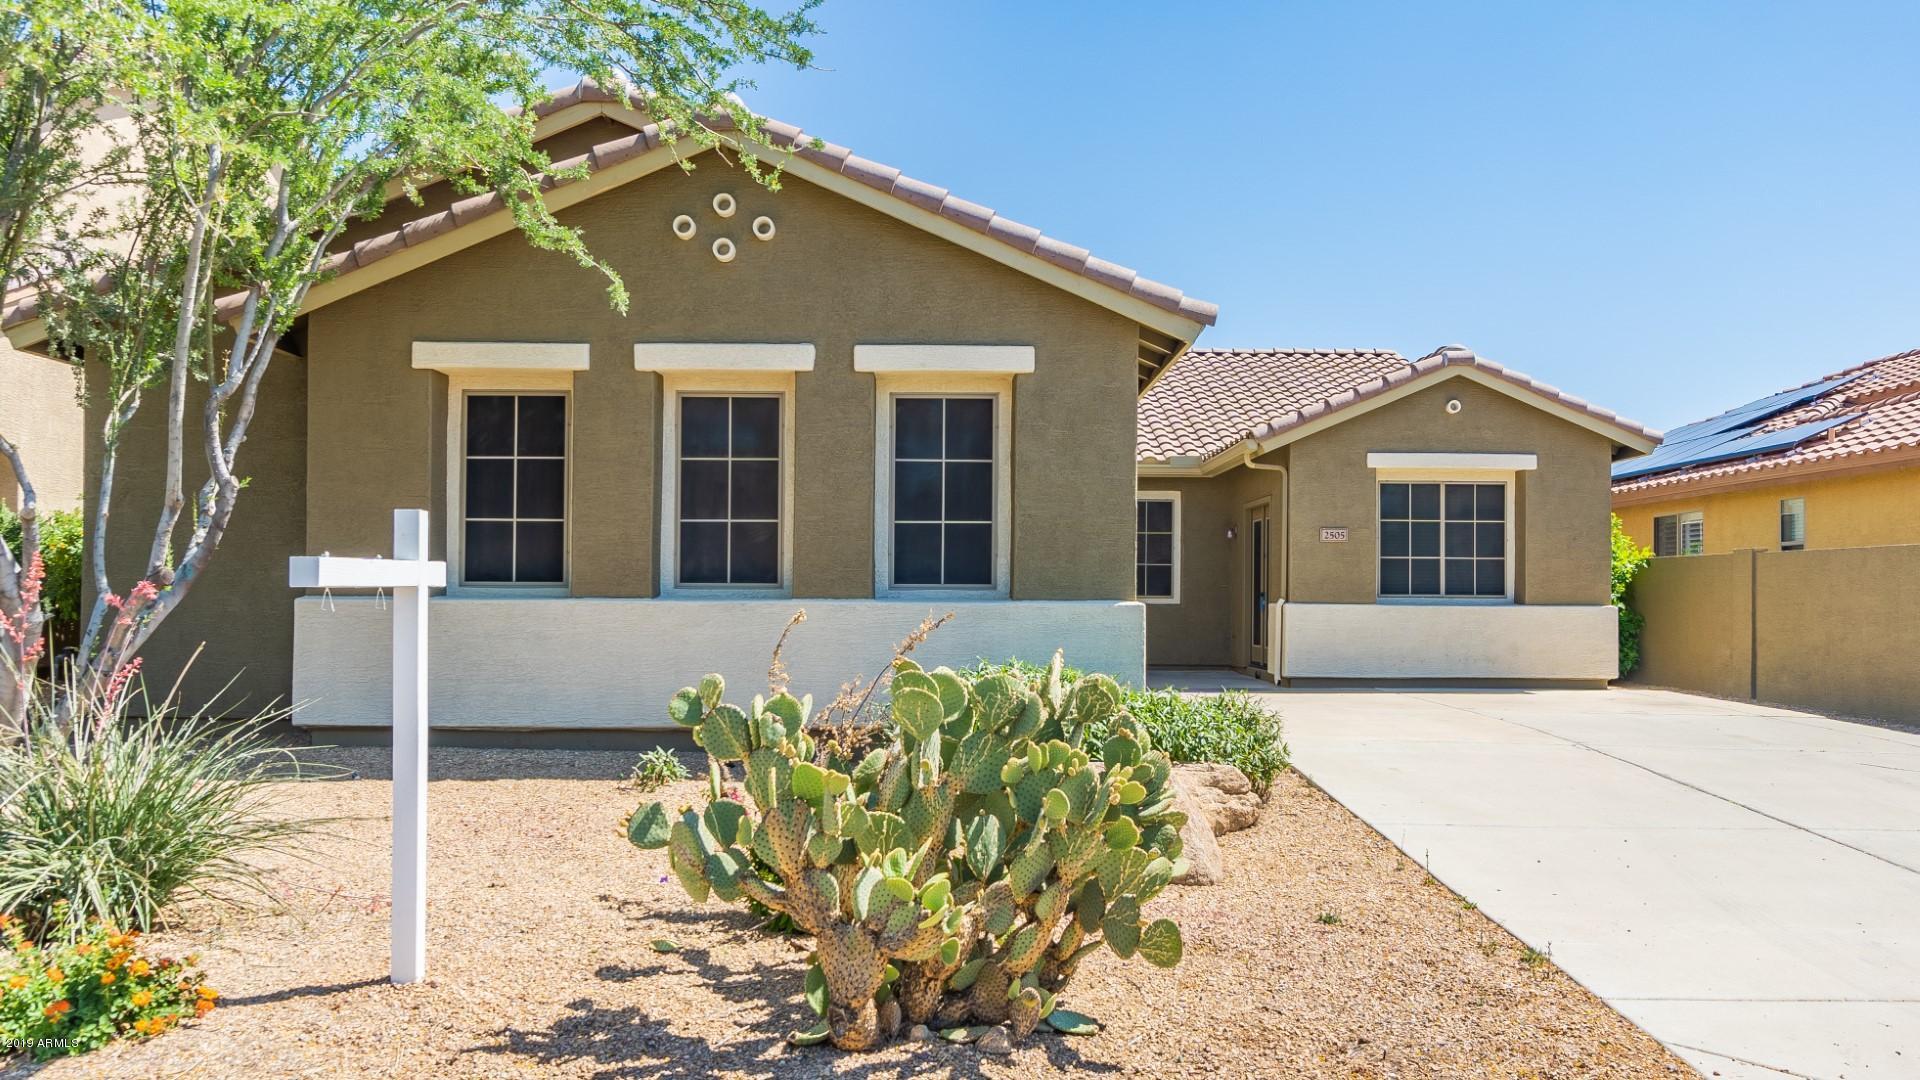 Photo of 2505 W SHACKLETON Drive, Phoenix, AZ 85086